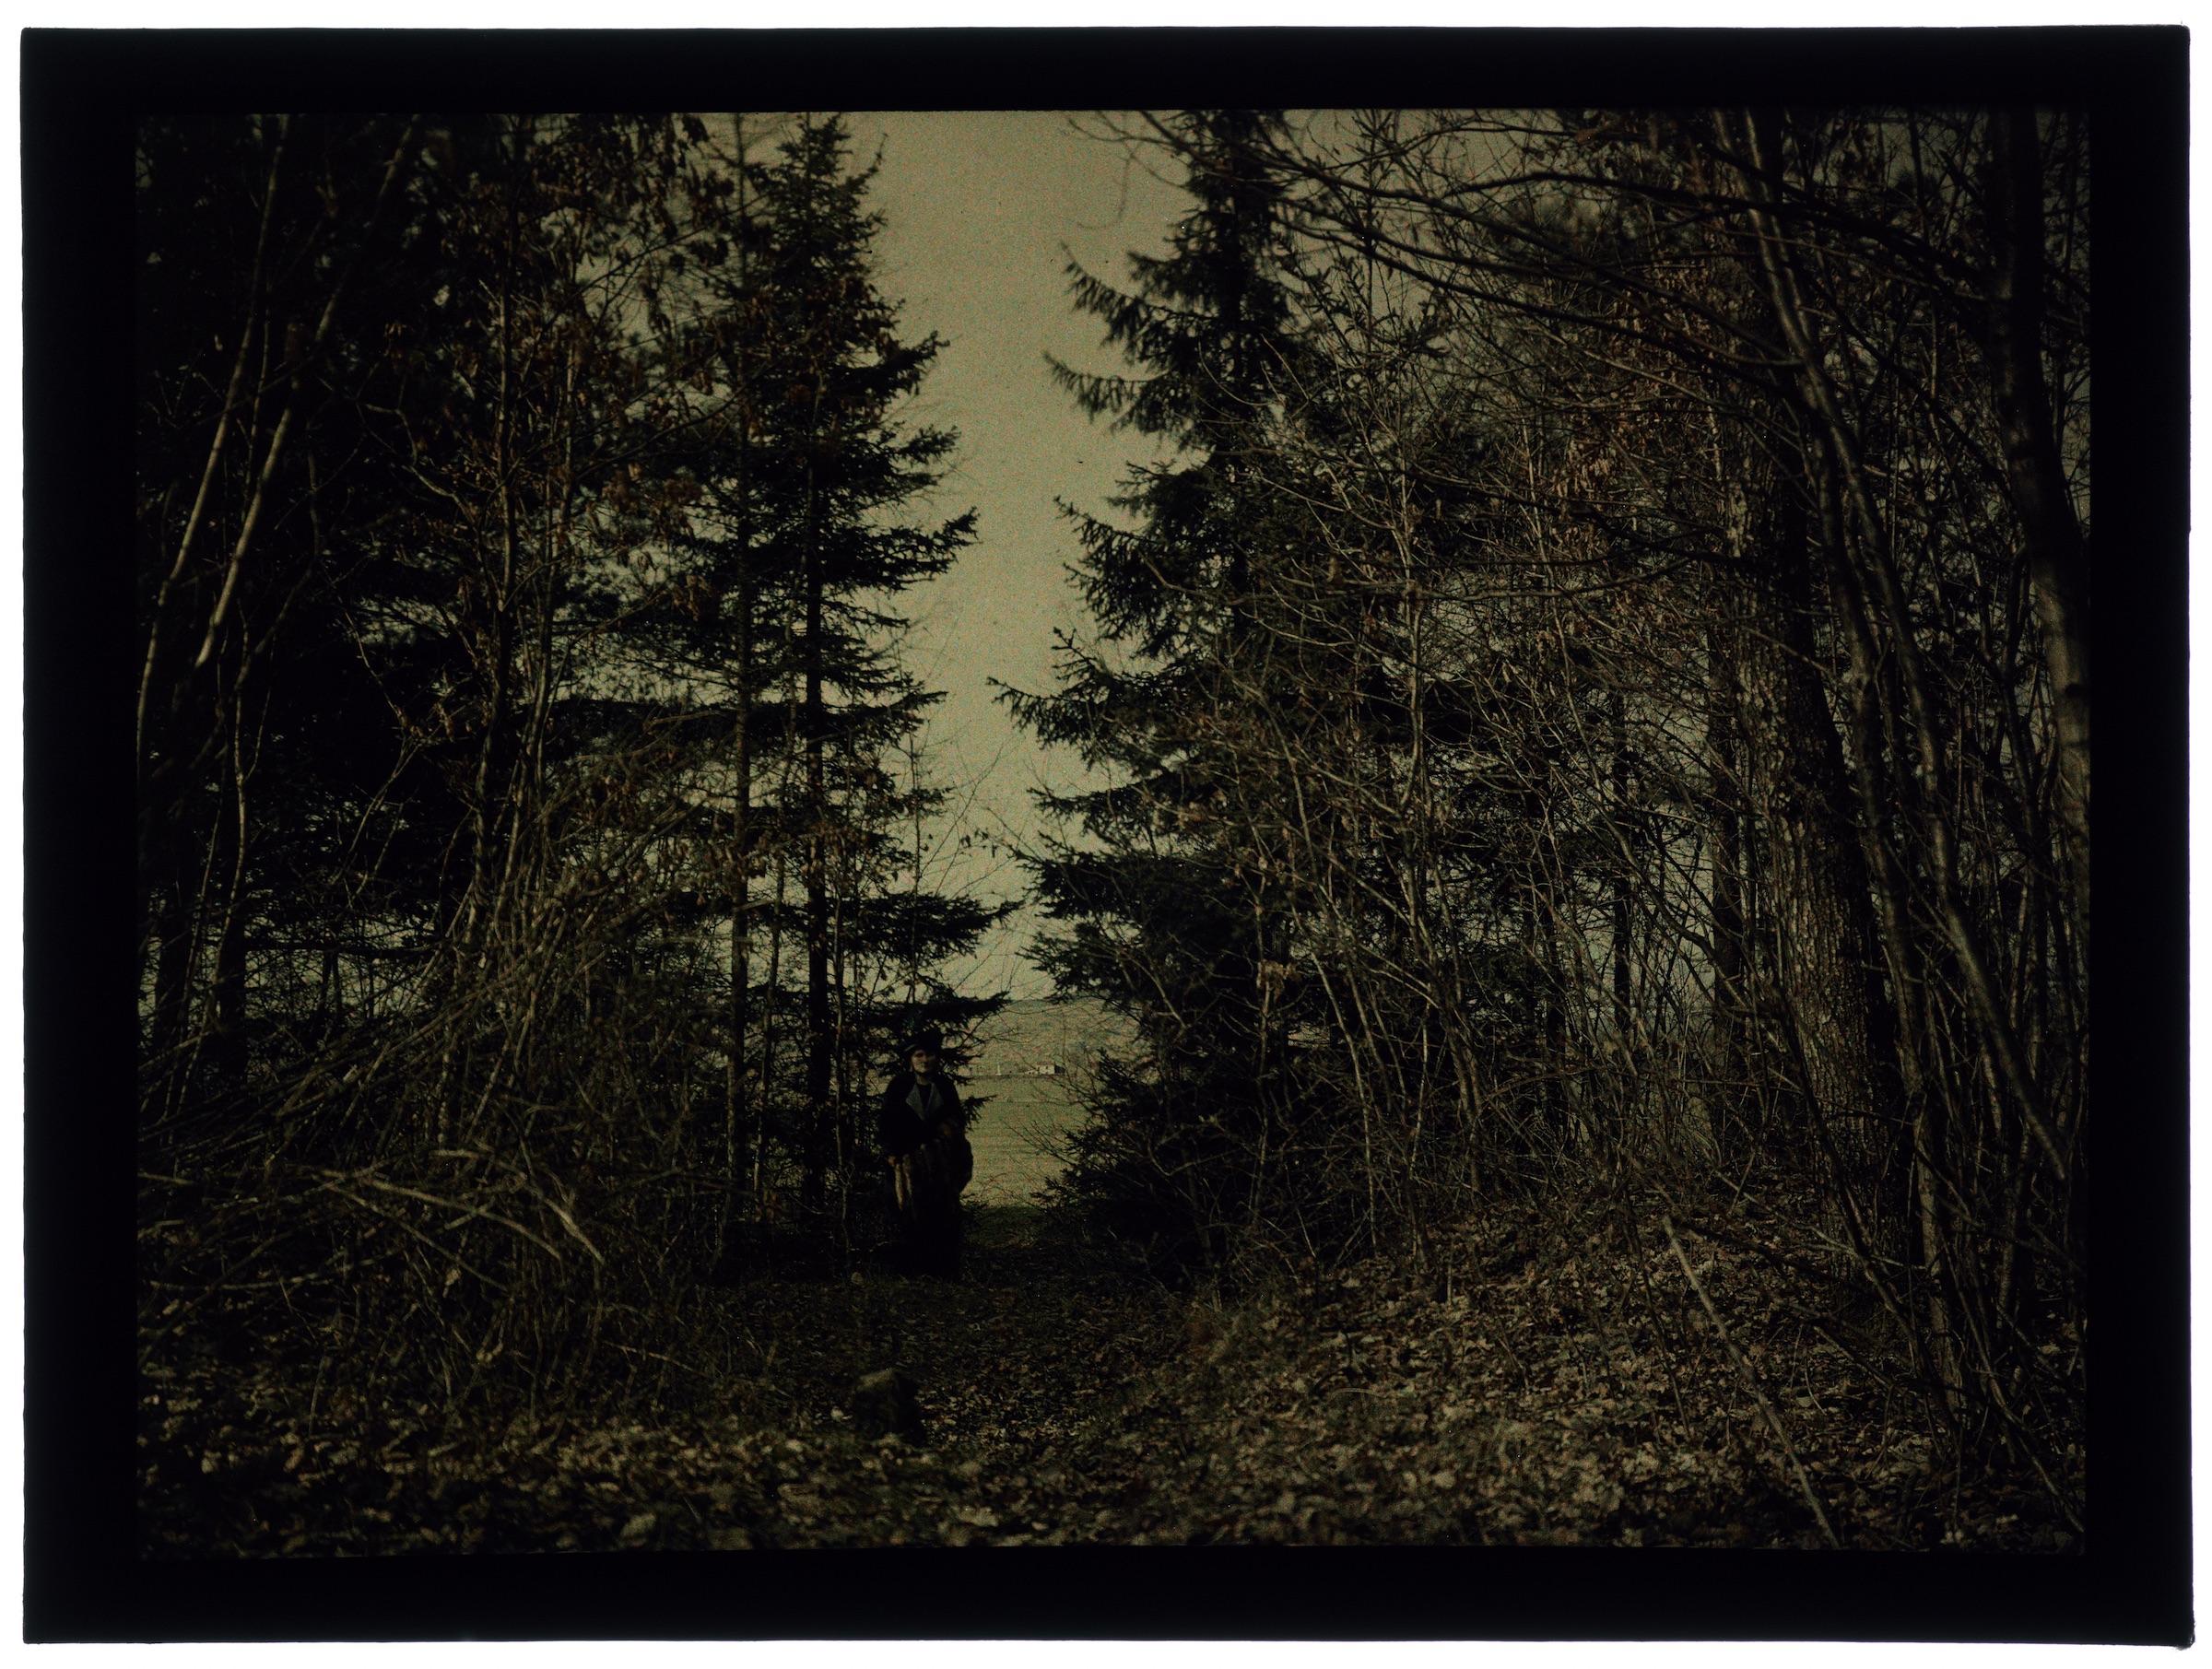 Femme ans la forêt